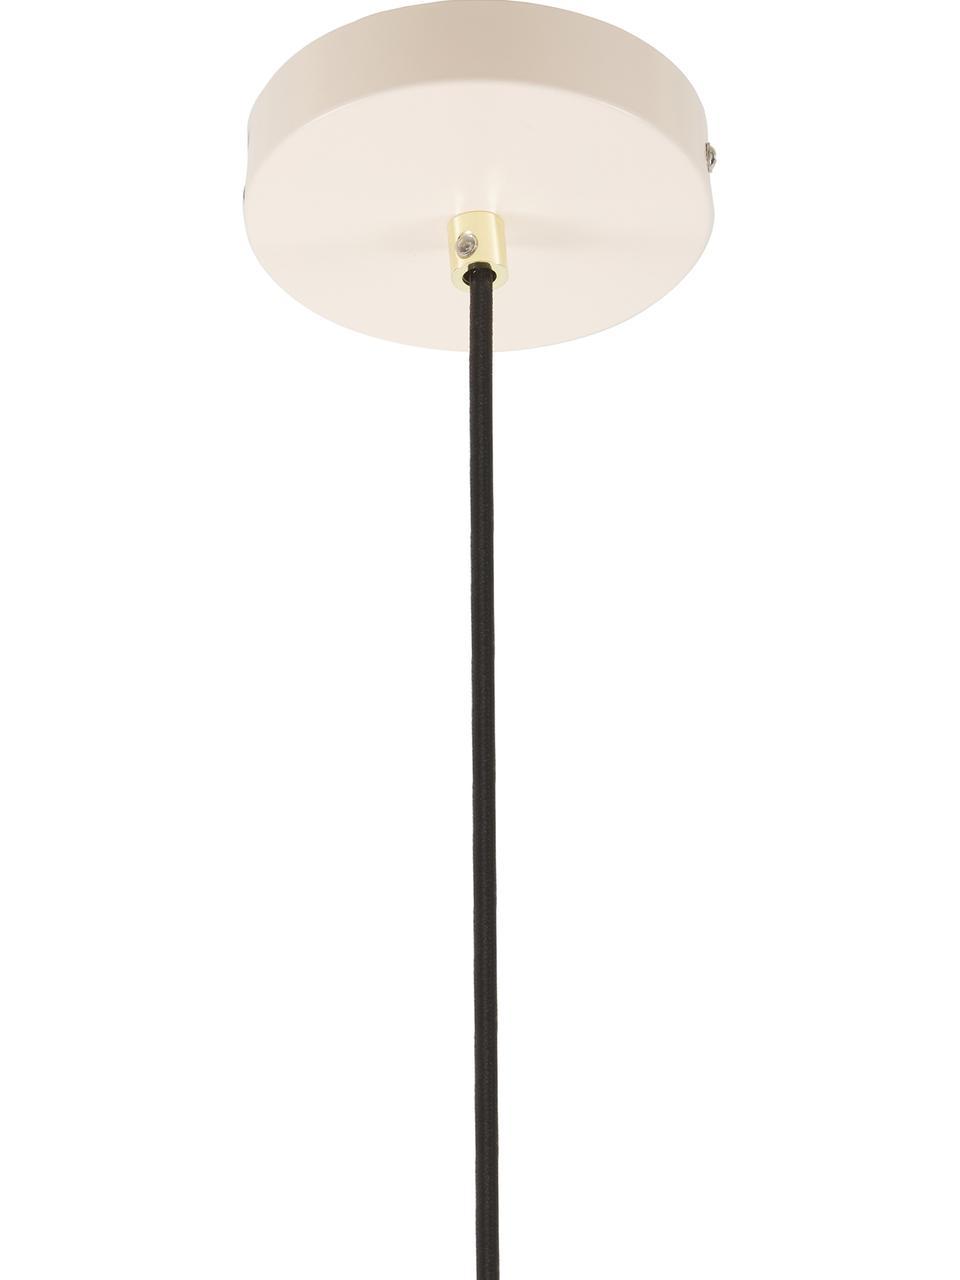 Pendelleuchte Wilma aus Metall, Lampenschirm: Metall, pulverbeschichtet, Baldachin: Metall, pulverbeschichtet, Dekor: Metall, galvanisiert, Rosa, Ø 33 x H 25 cm